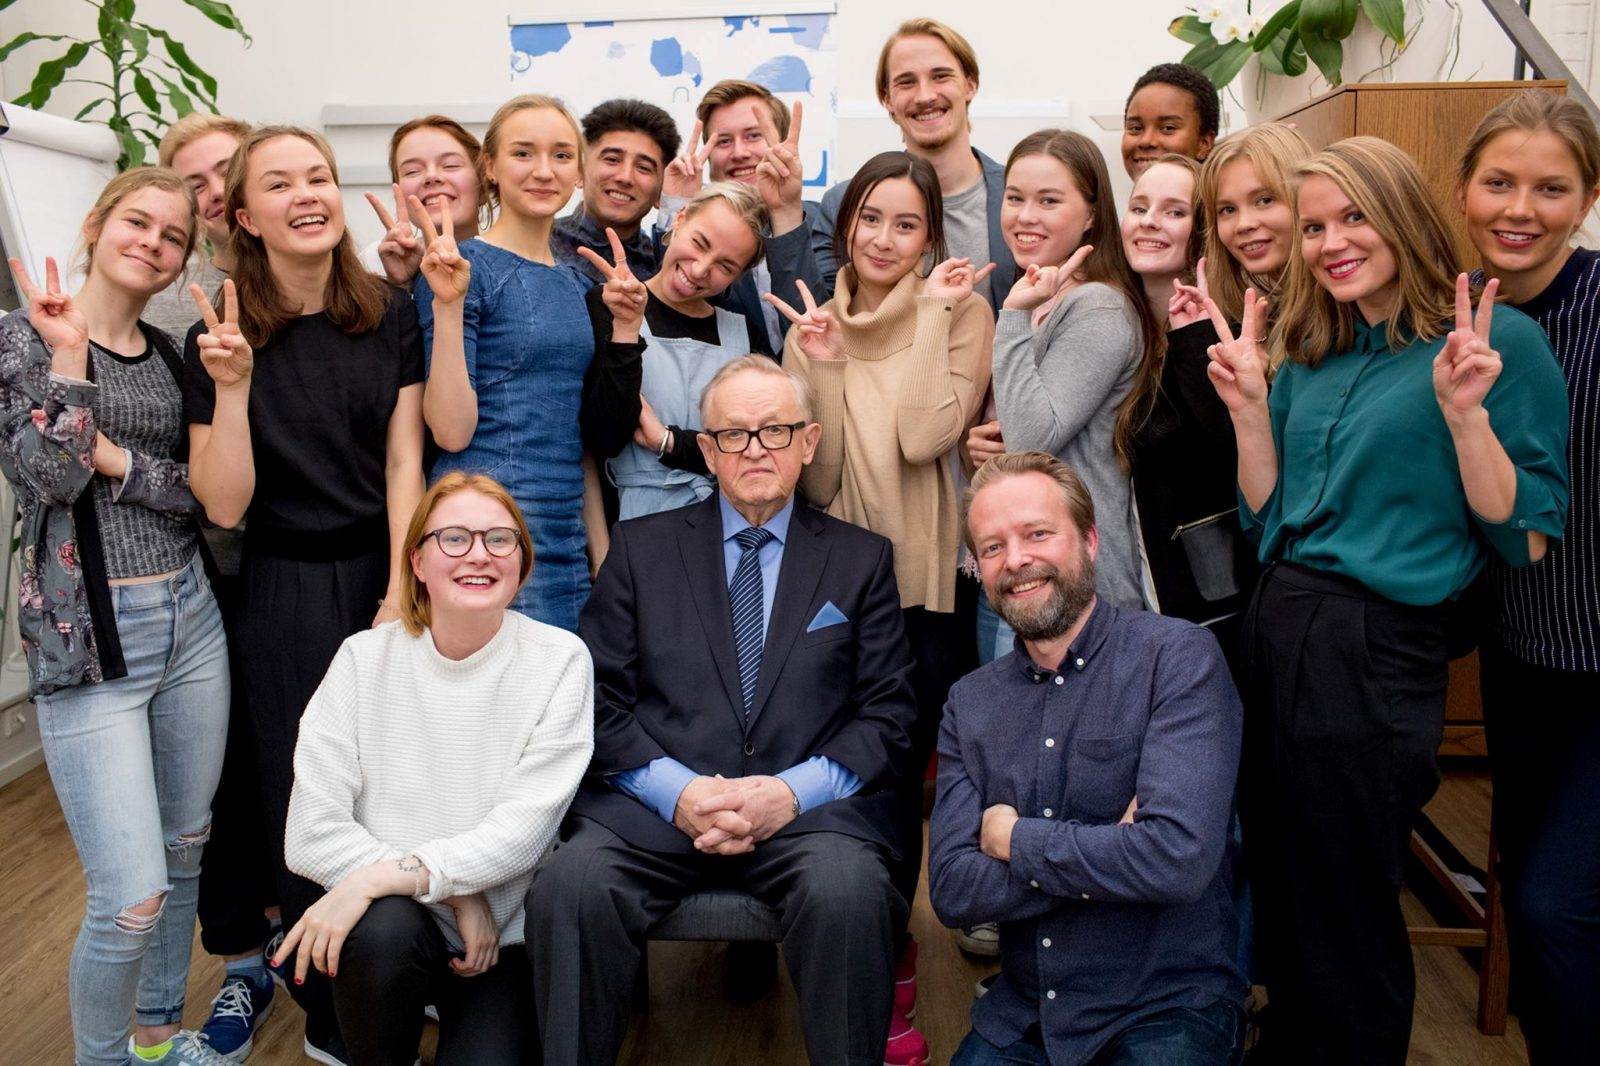 The Lennons got to meet CMI's founder, Martti Ahtisaari, a veteran peace mediator and Nobel Peace Prize laureate.